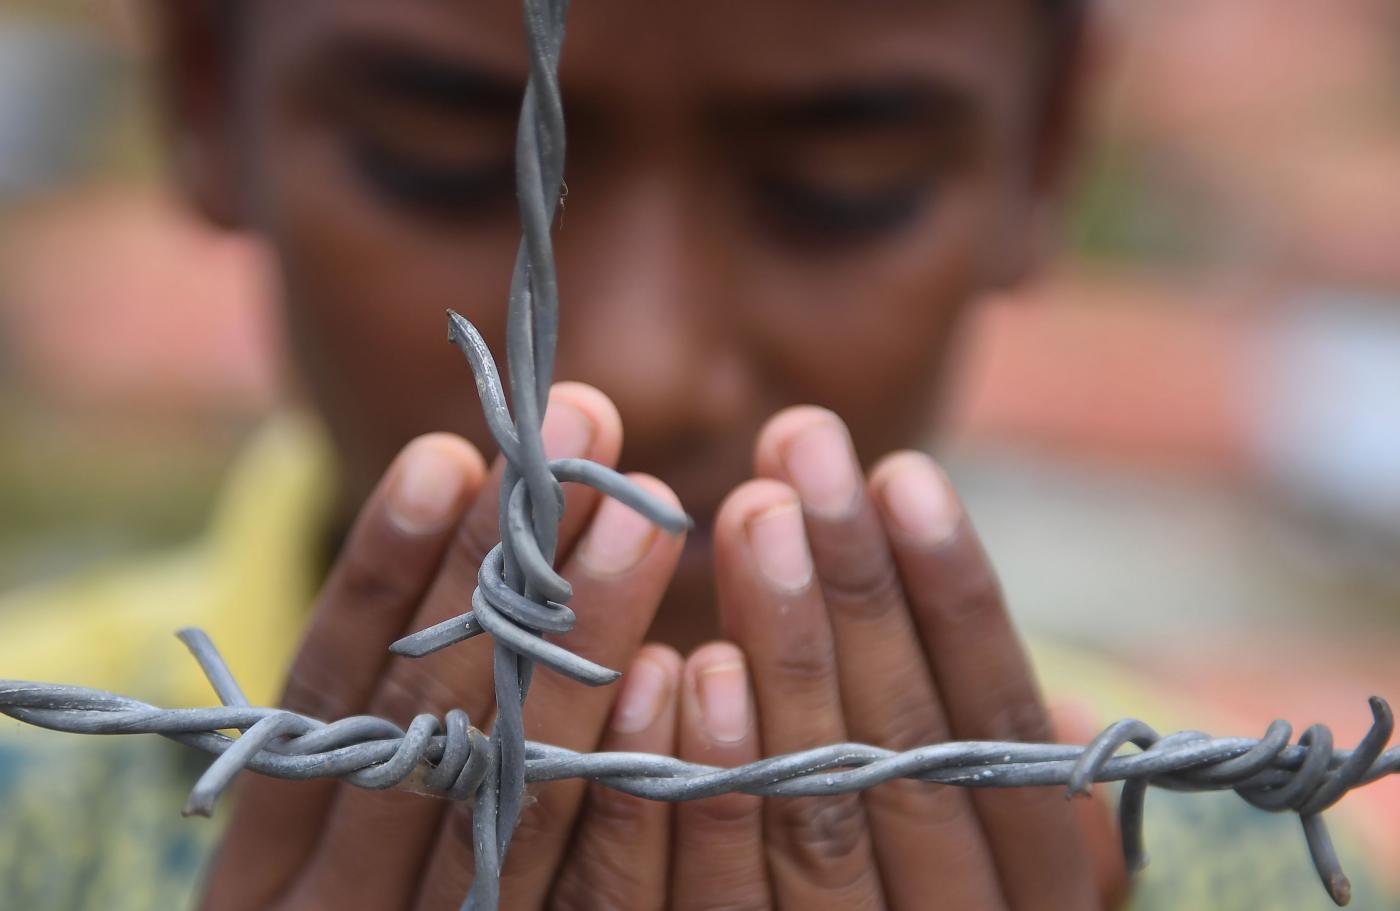 Le terribili torture ai Rohingya: i musulmani perseguitati del Myanmar (LaPresse)